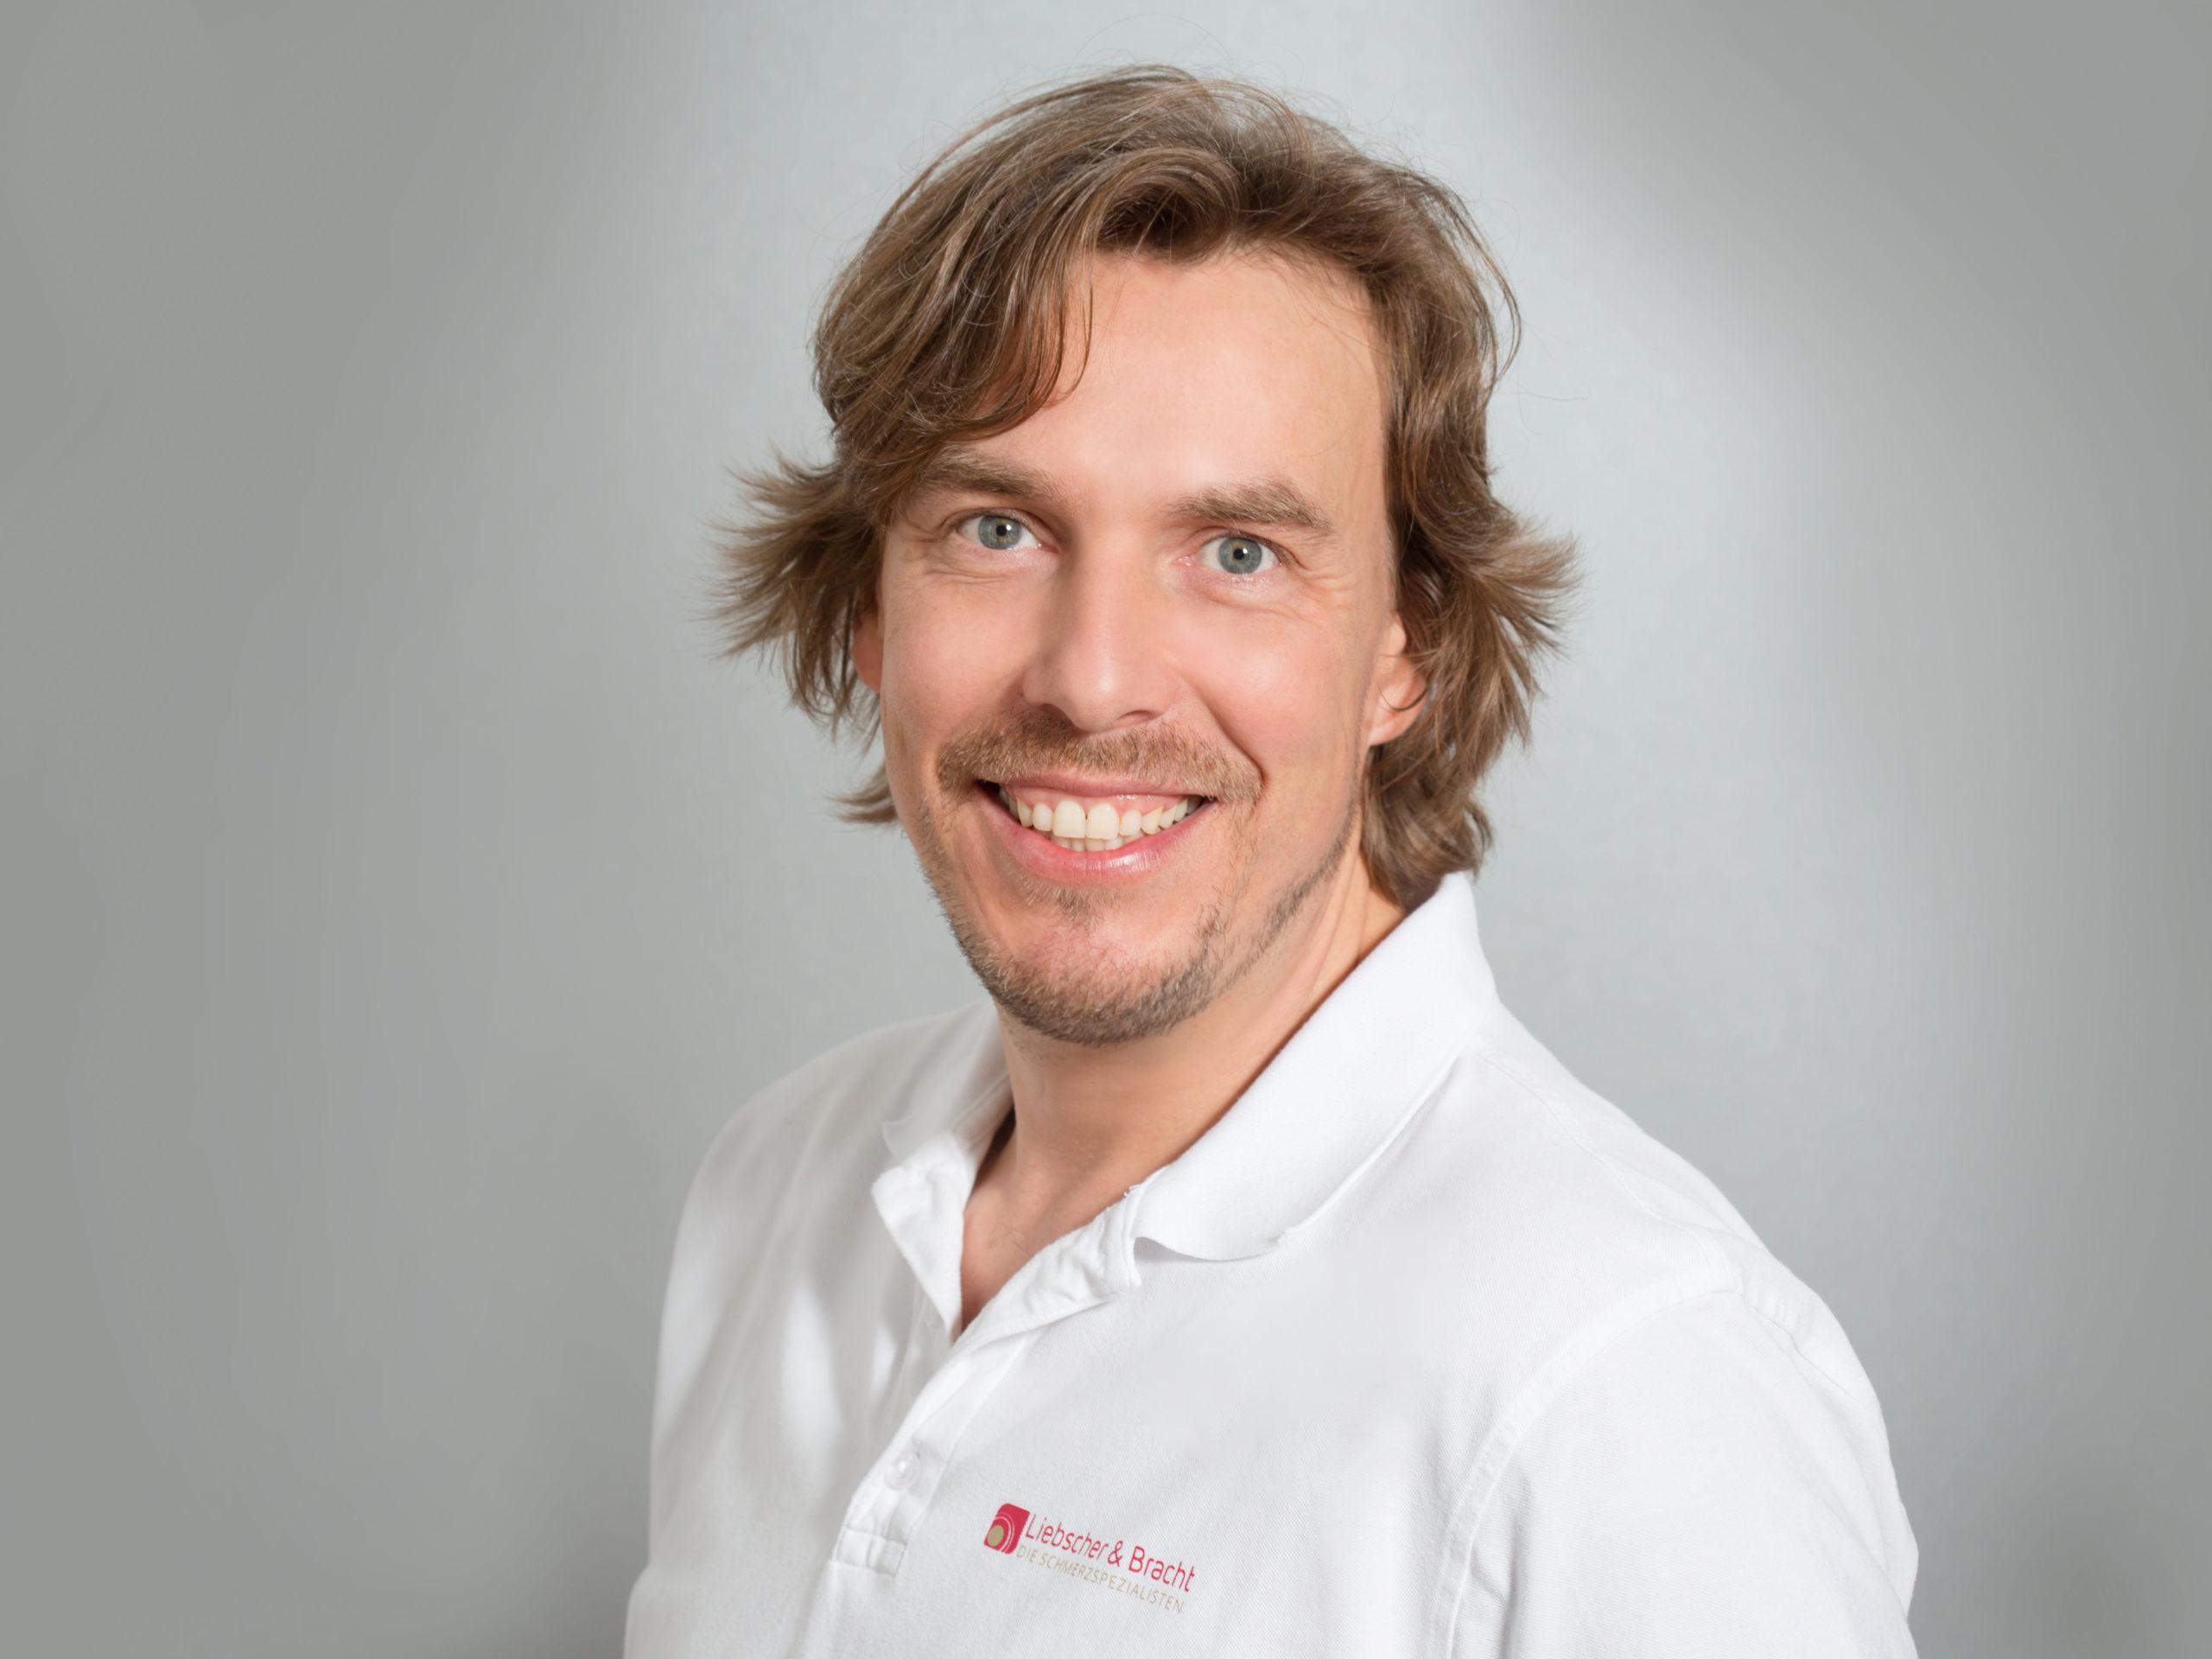 Dirk Gorholt